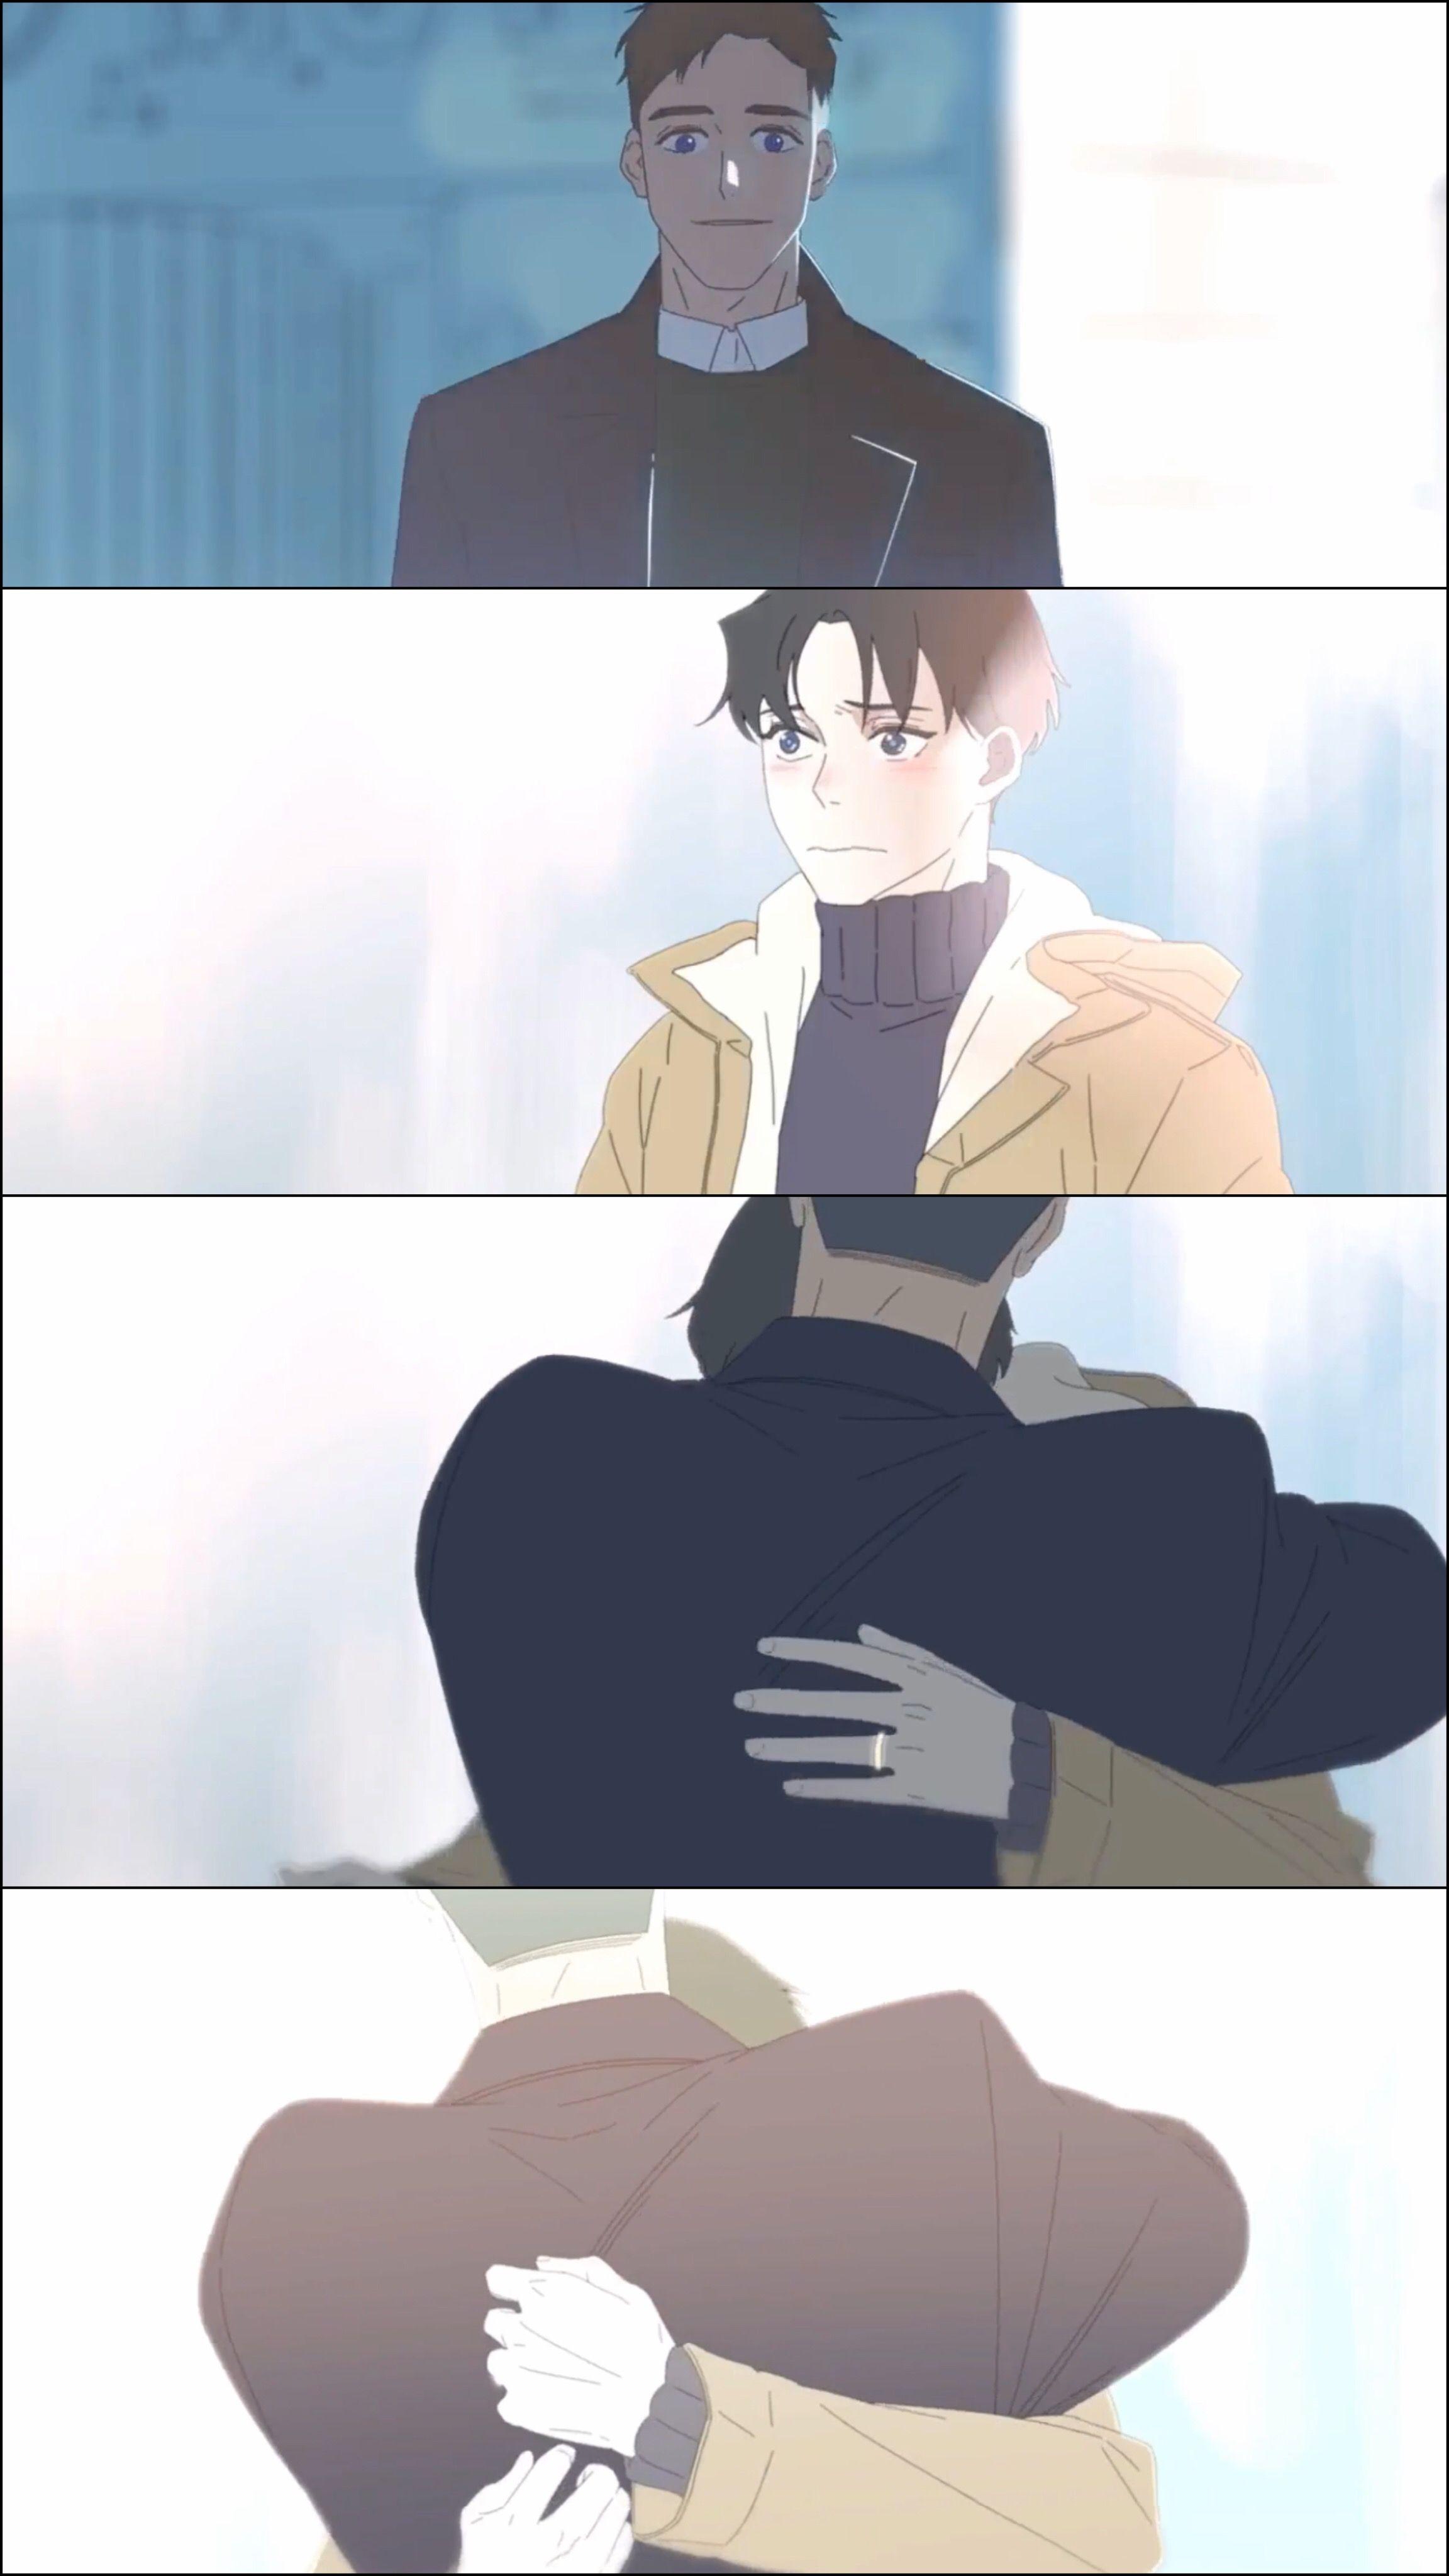 Hyperventilation Anime Manga Anime Anime Romance Hyperventilation bl anime by @lewin00000 on twitter. pinterest